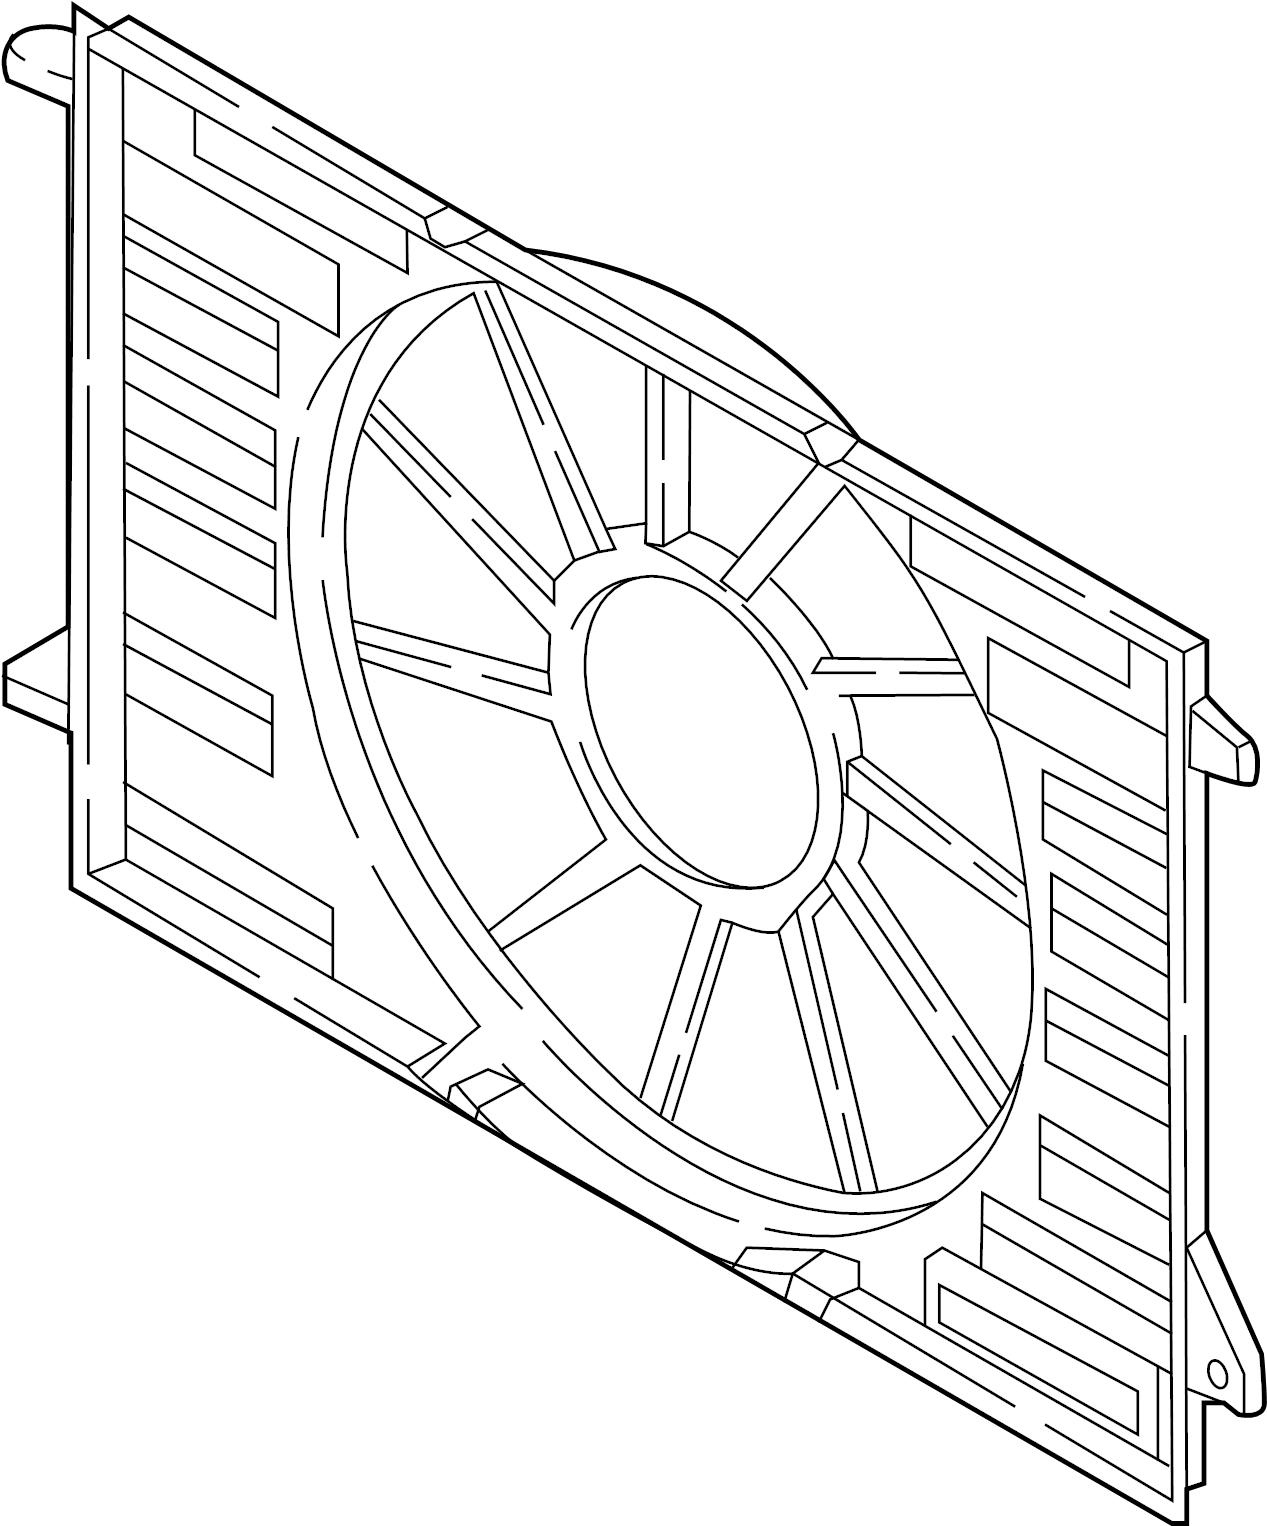 Audi A4 Engine Cooling Fan Shroud Liter Towing Pkg